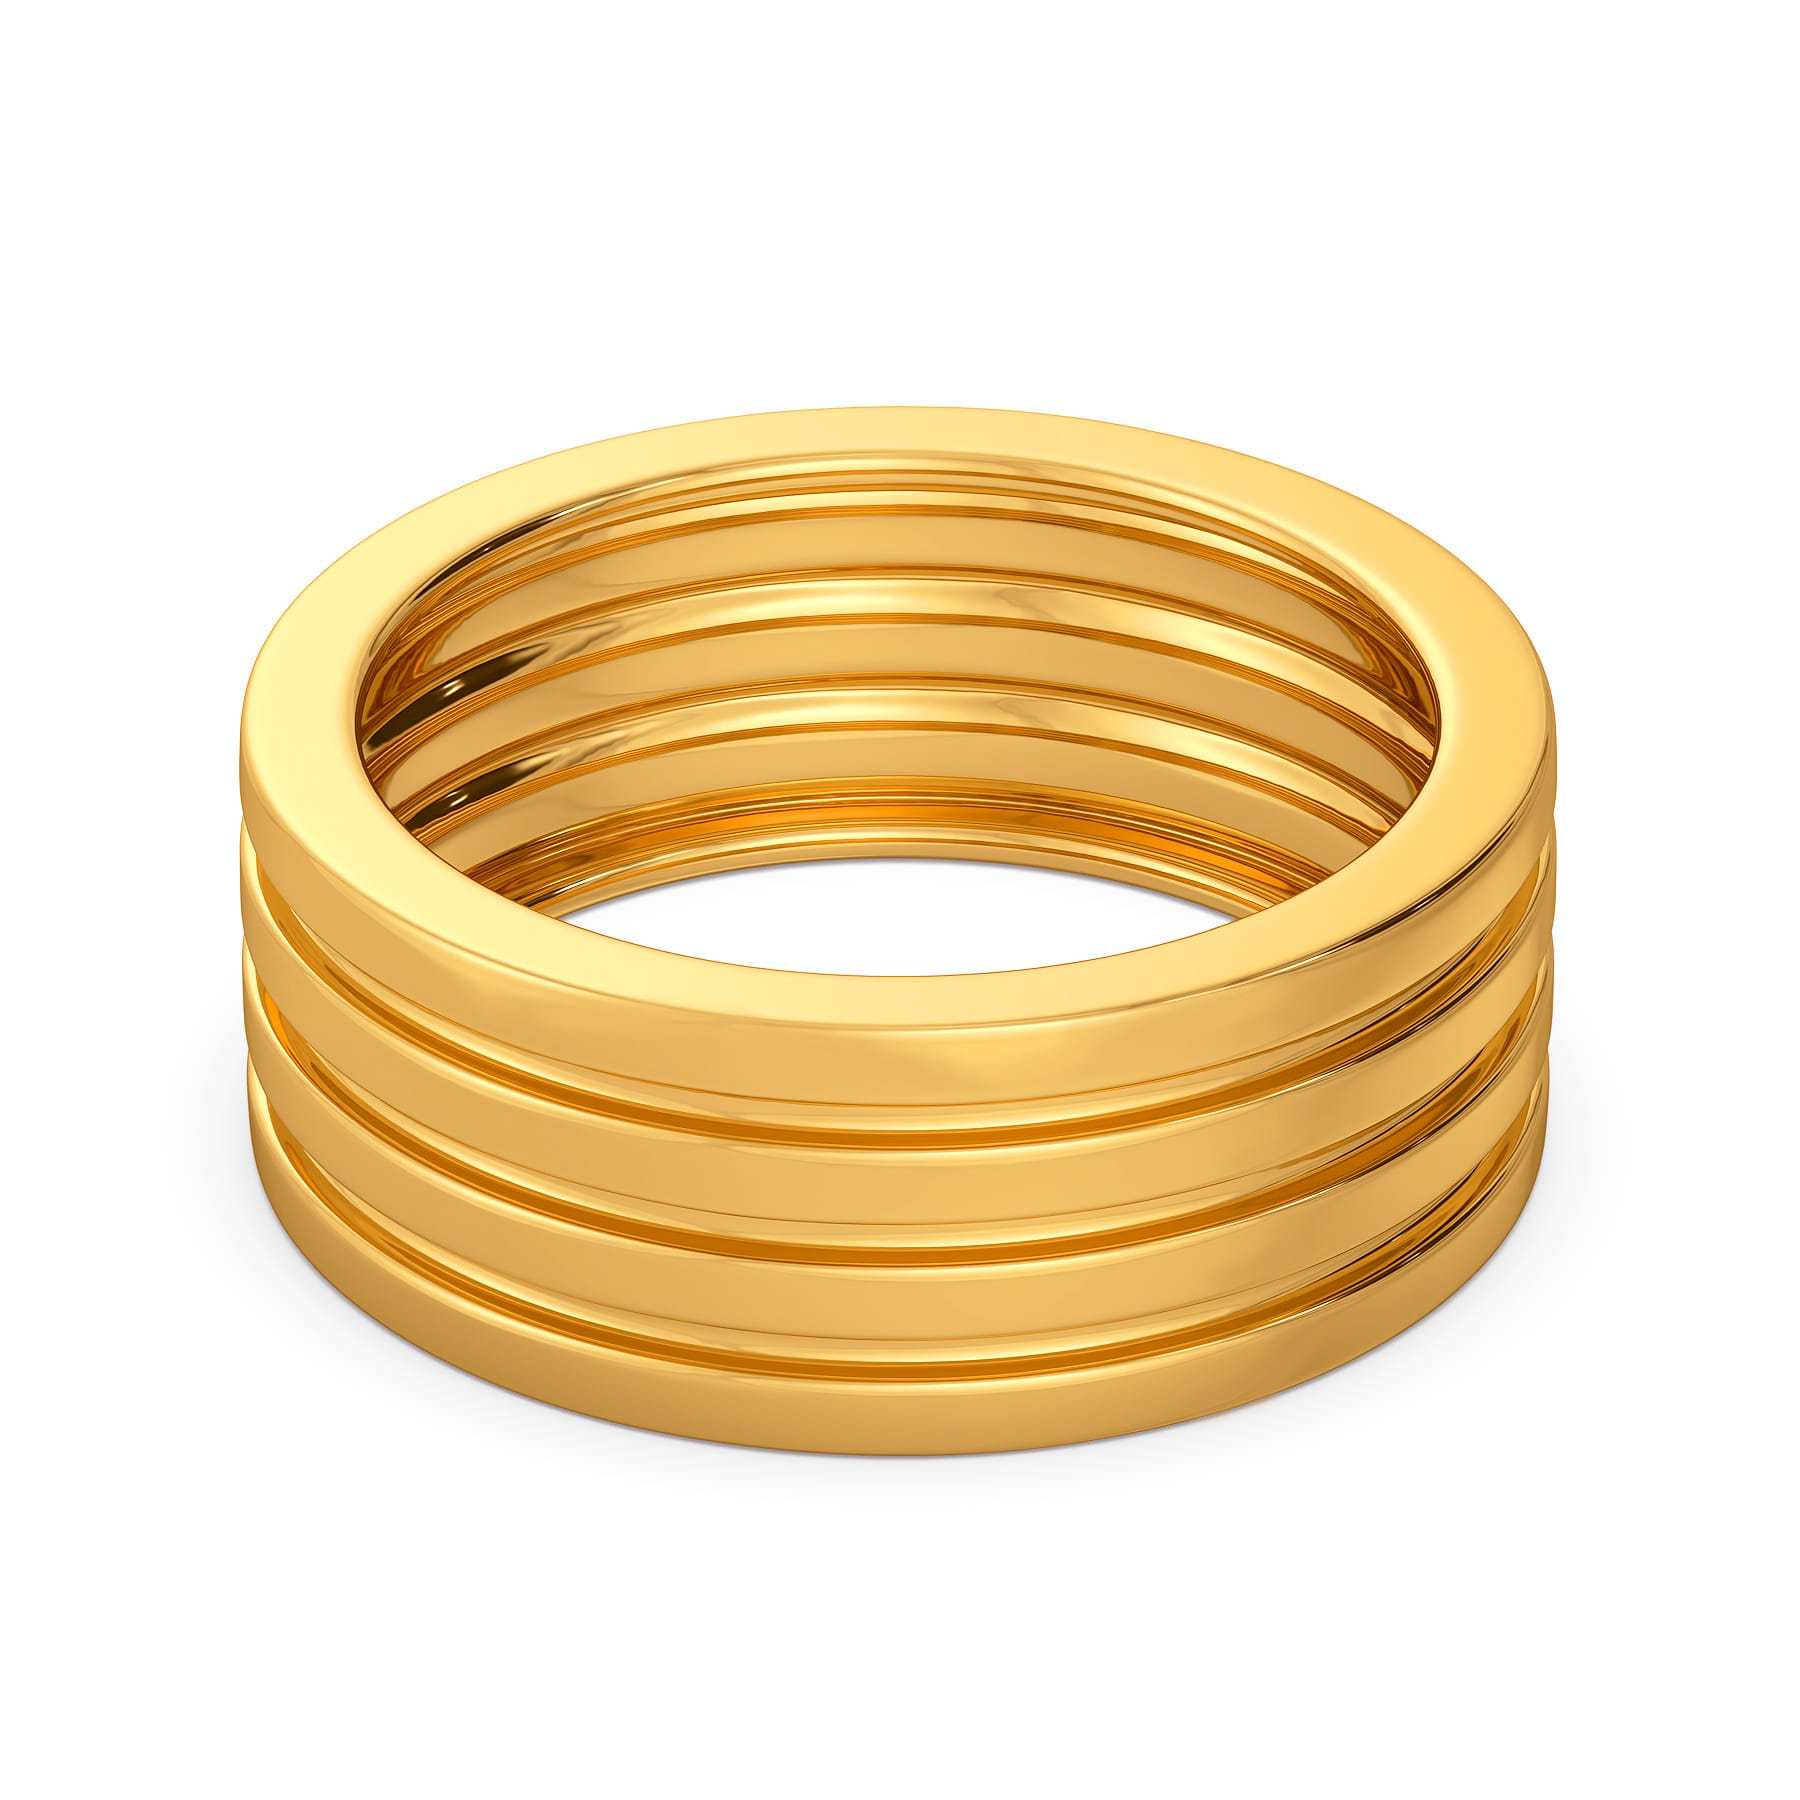 Fold Flow Gold Rings